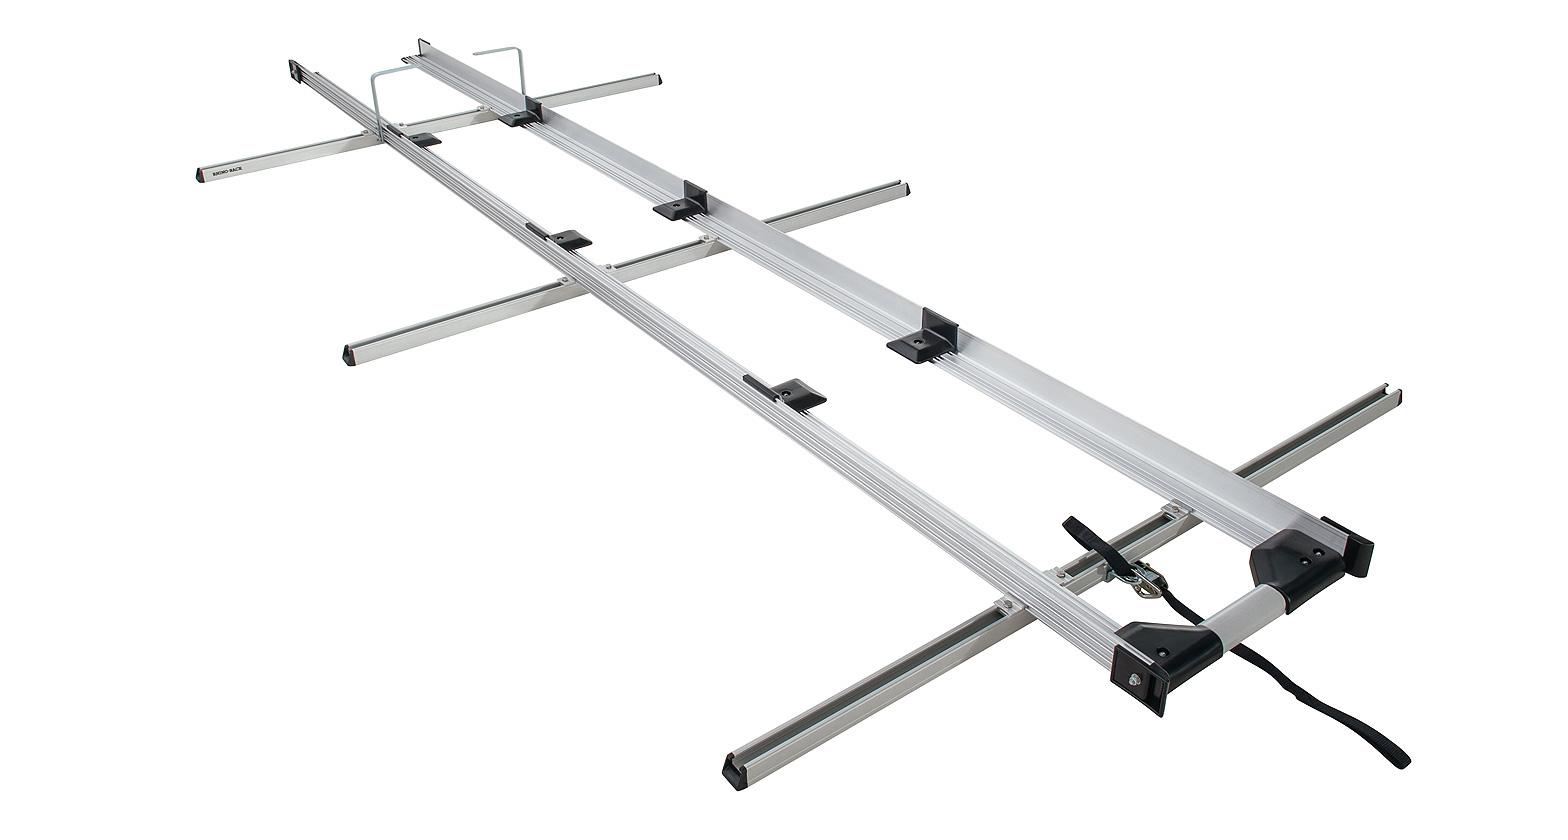 Ms40 470 Multi Slide Extension Ladder Rack 4m 13ft